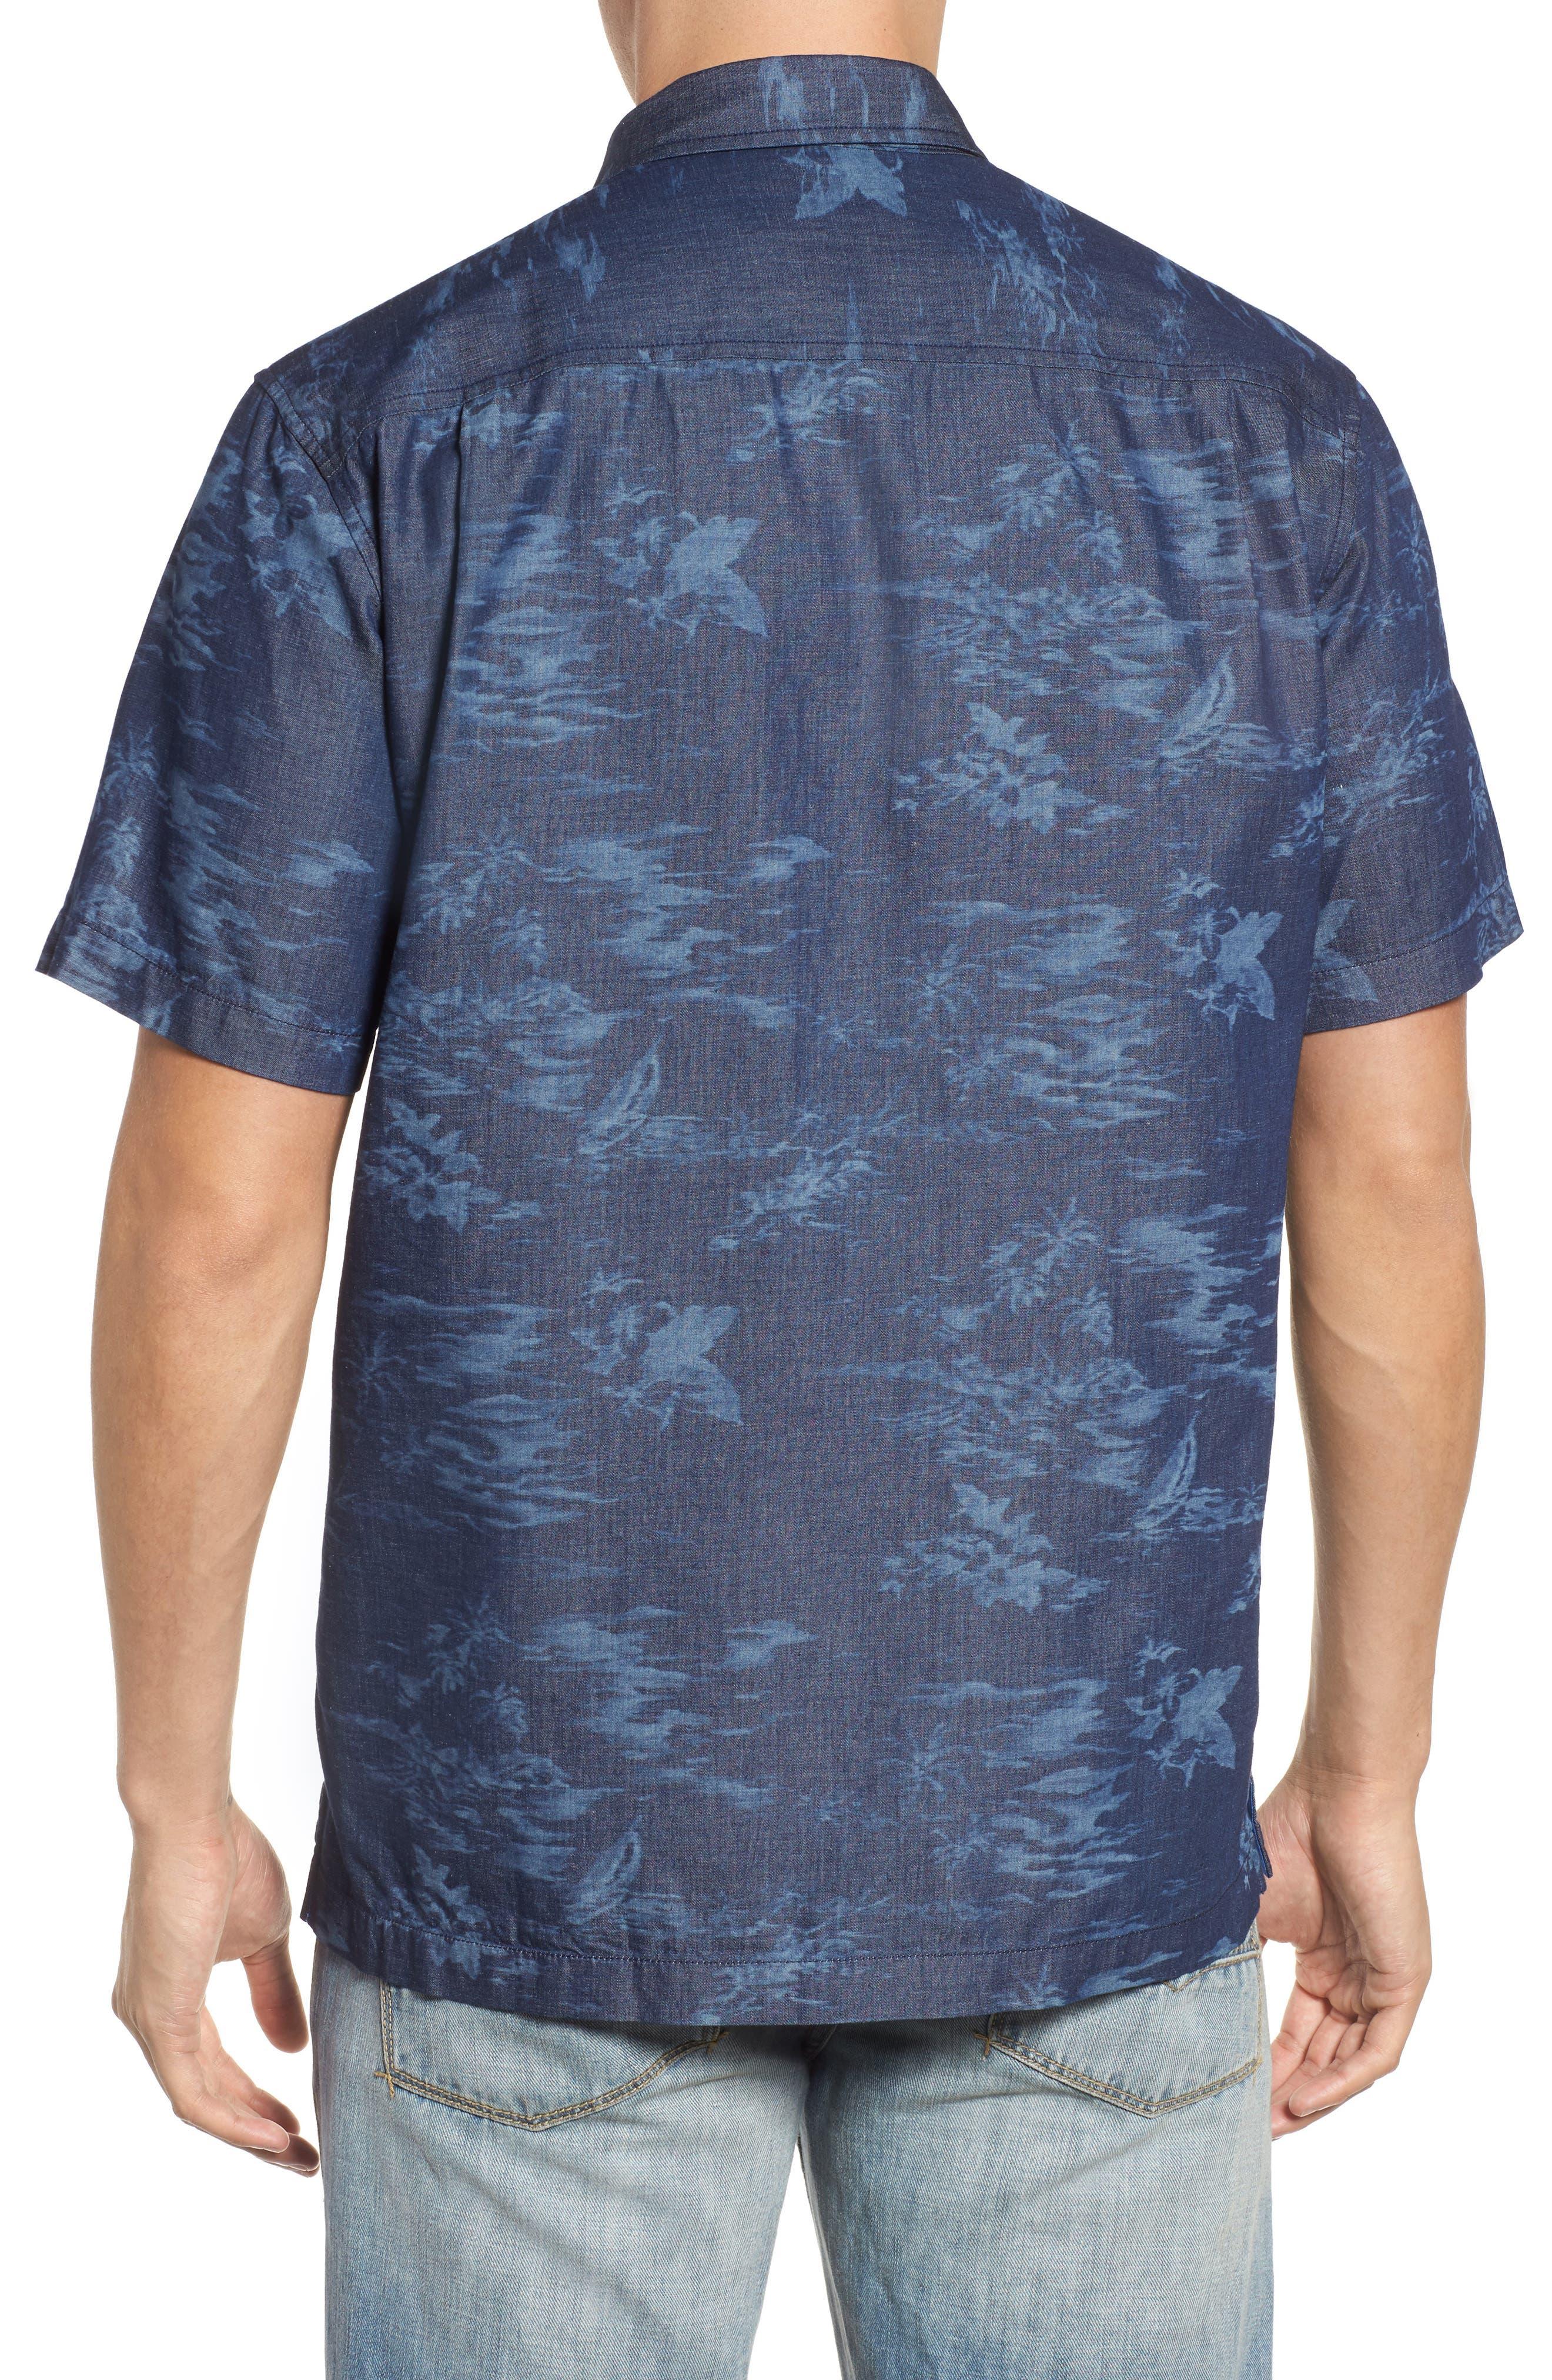 South Beach Scenic Sport Shirt,                             Alternate thumbnail 2, color,                             Indigo